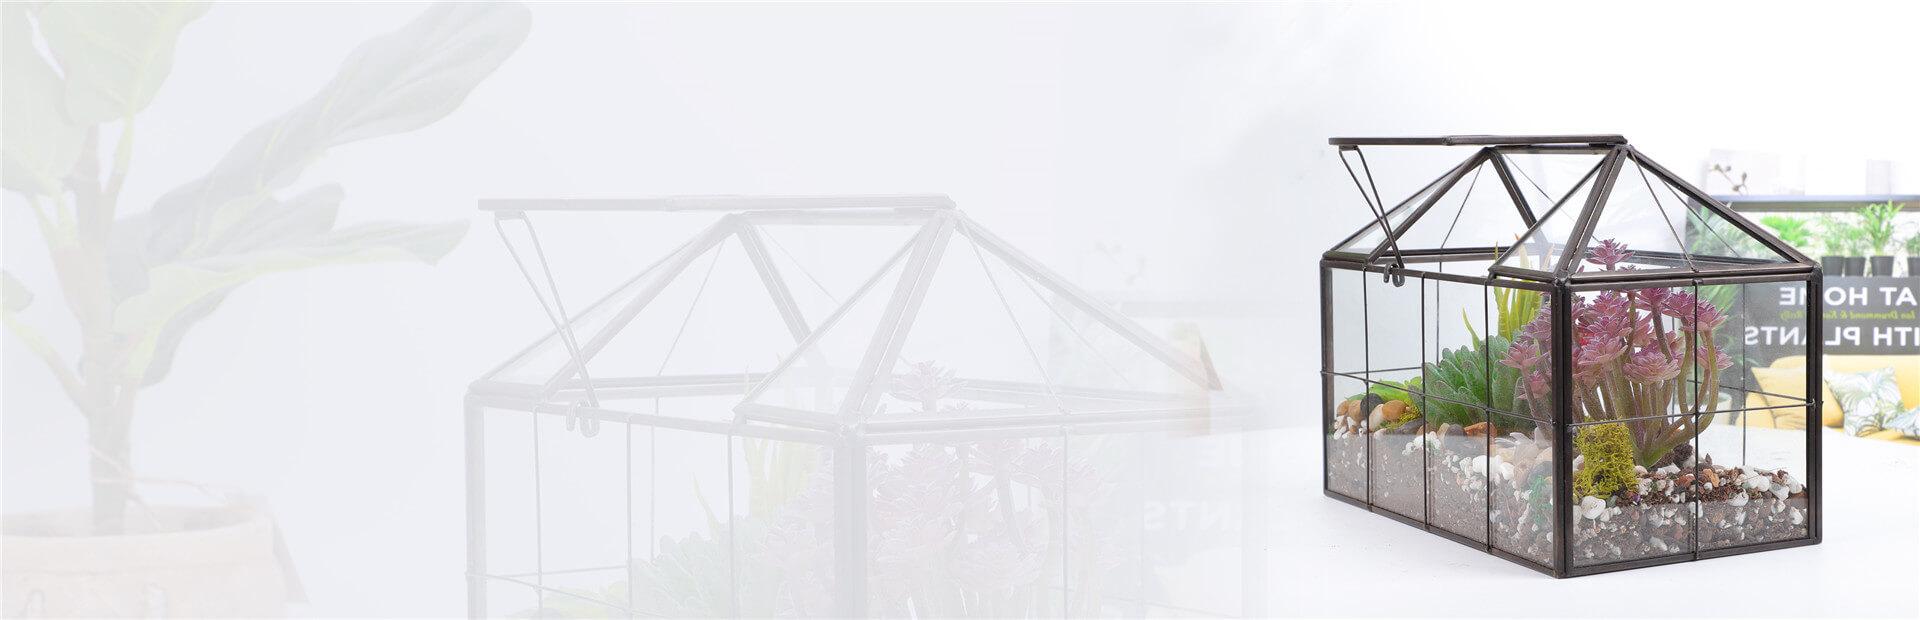 glass terrarium banner